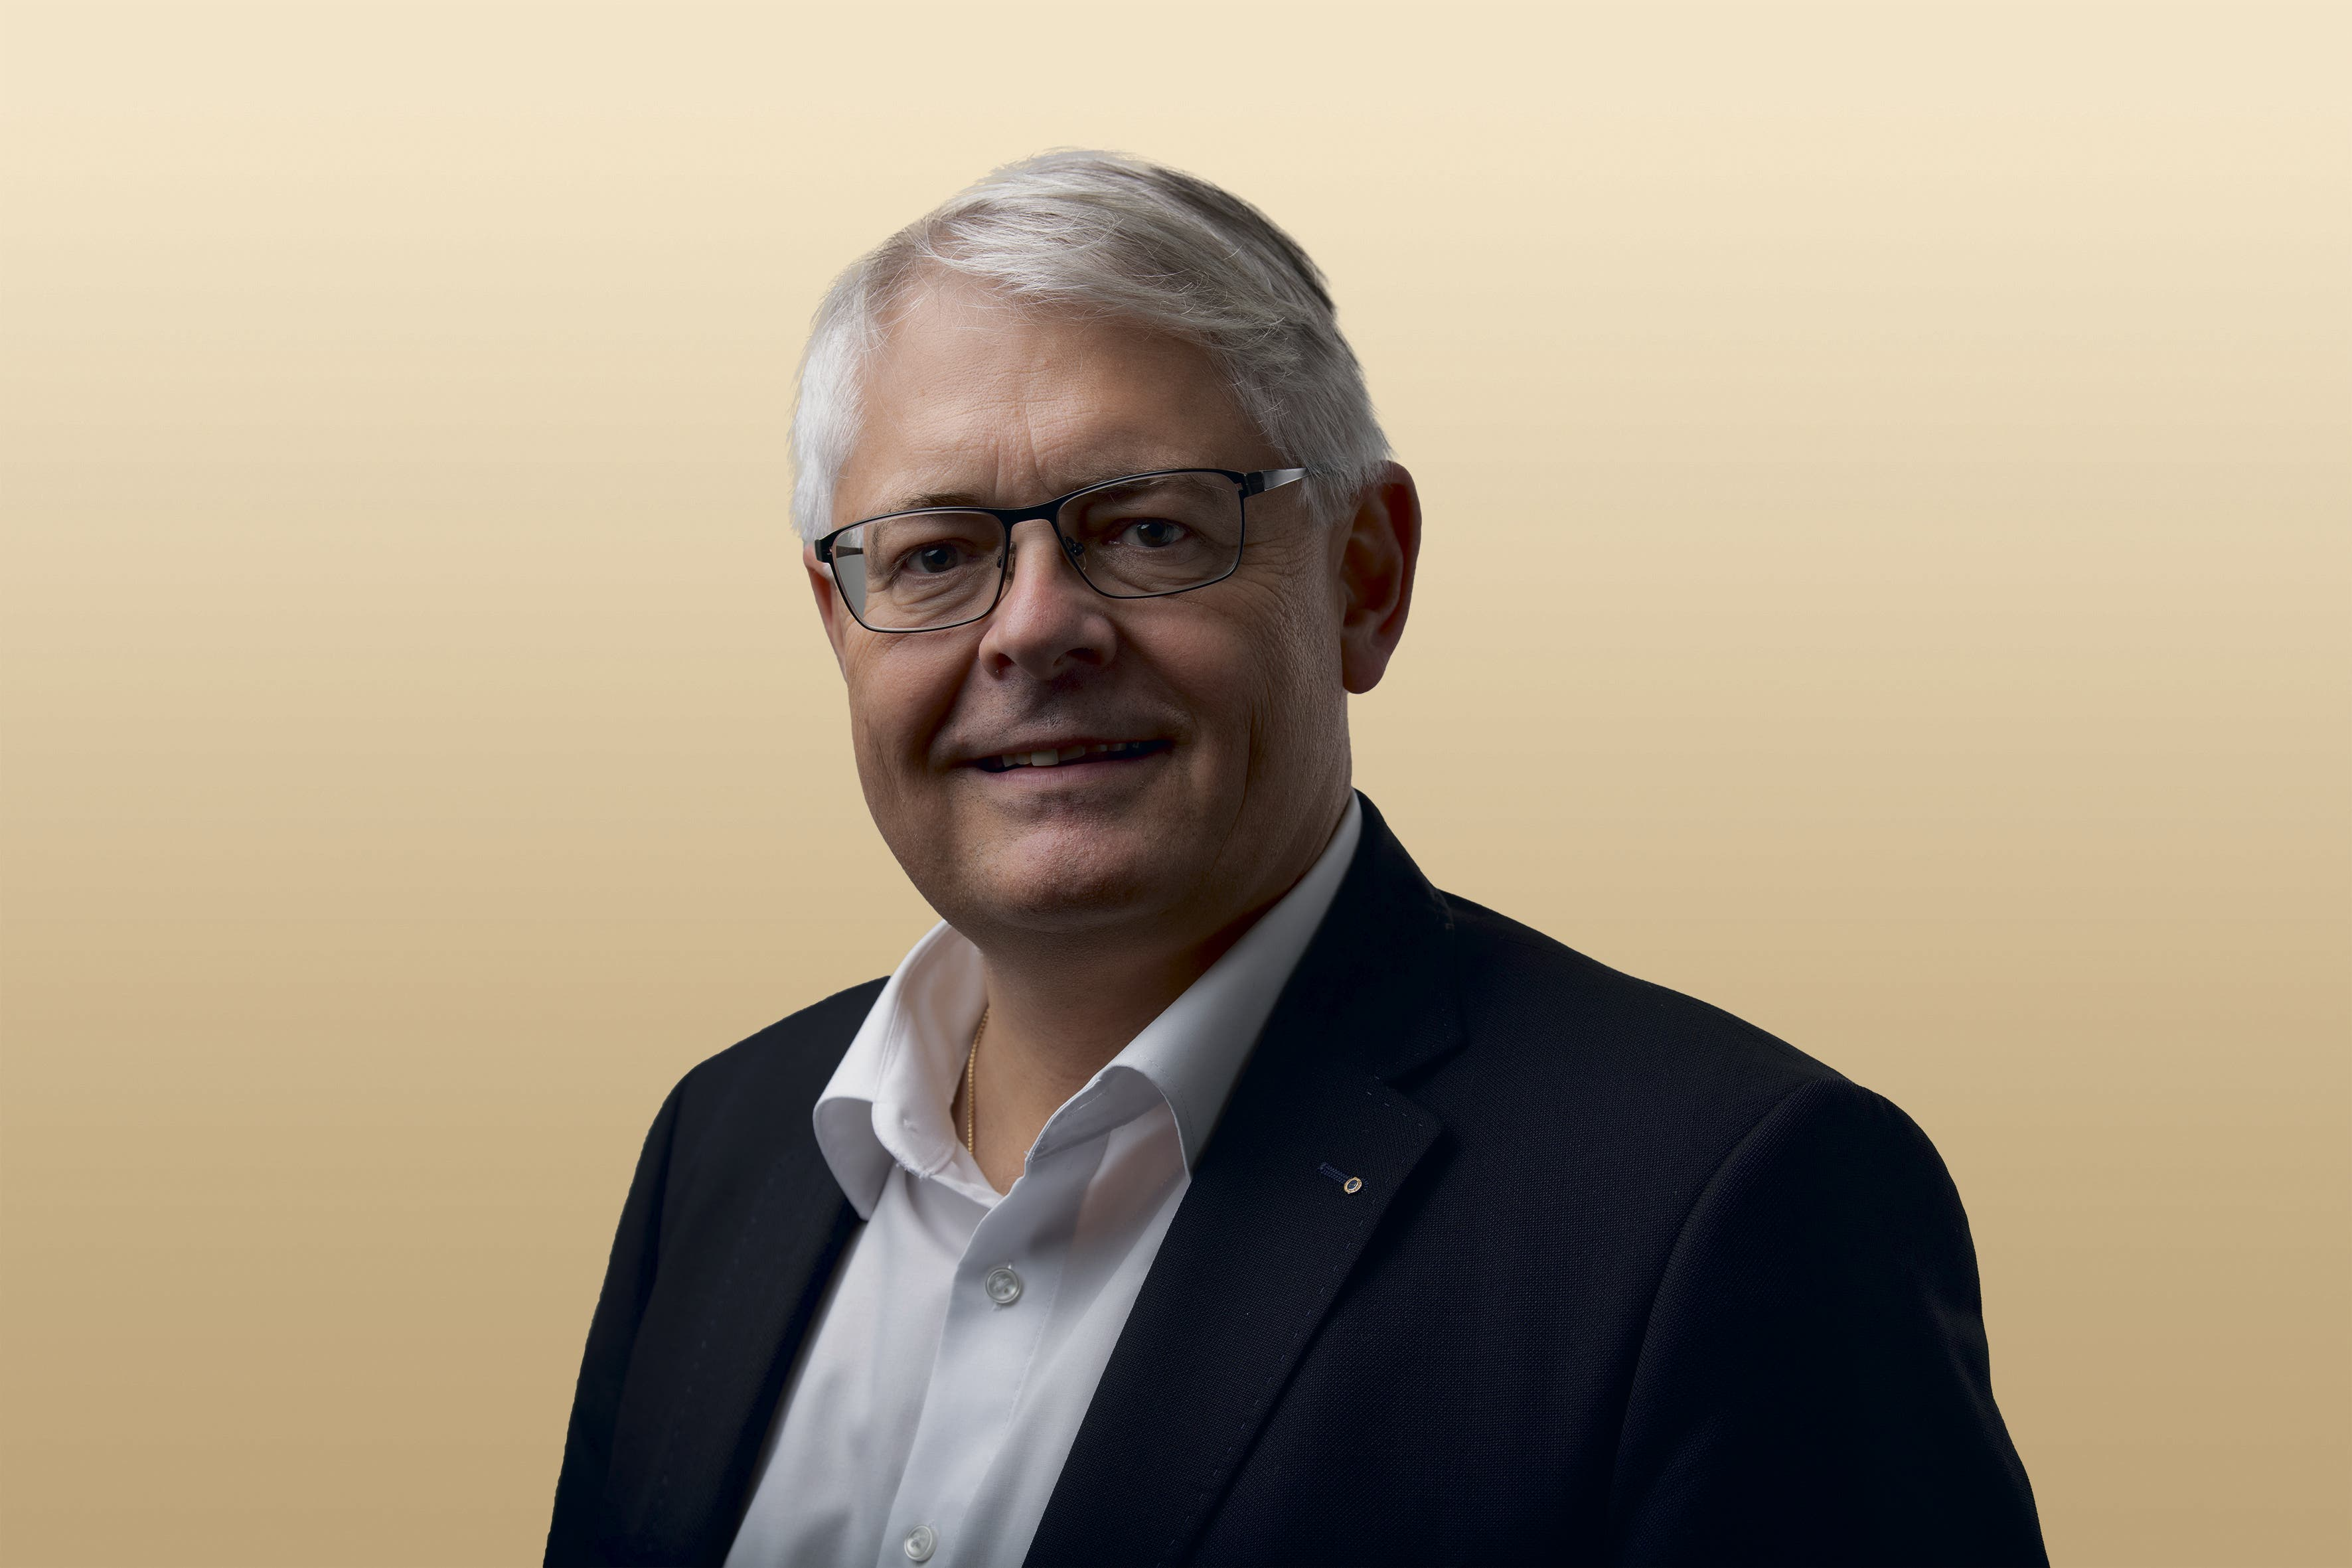 Andreas Bilger, CVP, 1963, Rechtsanwalt und Notar, seit 2012